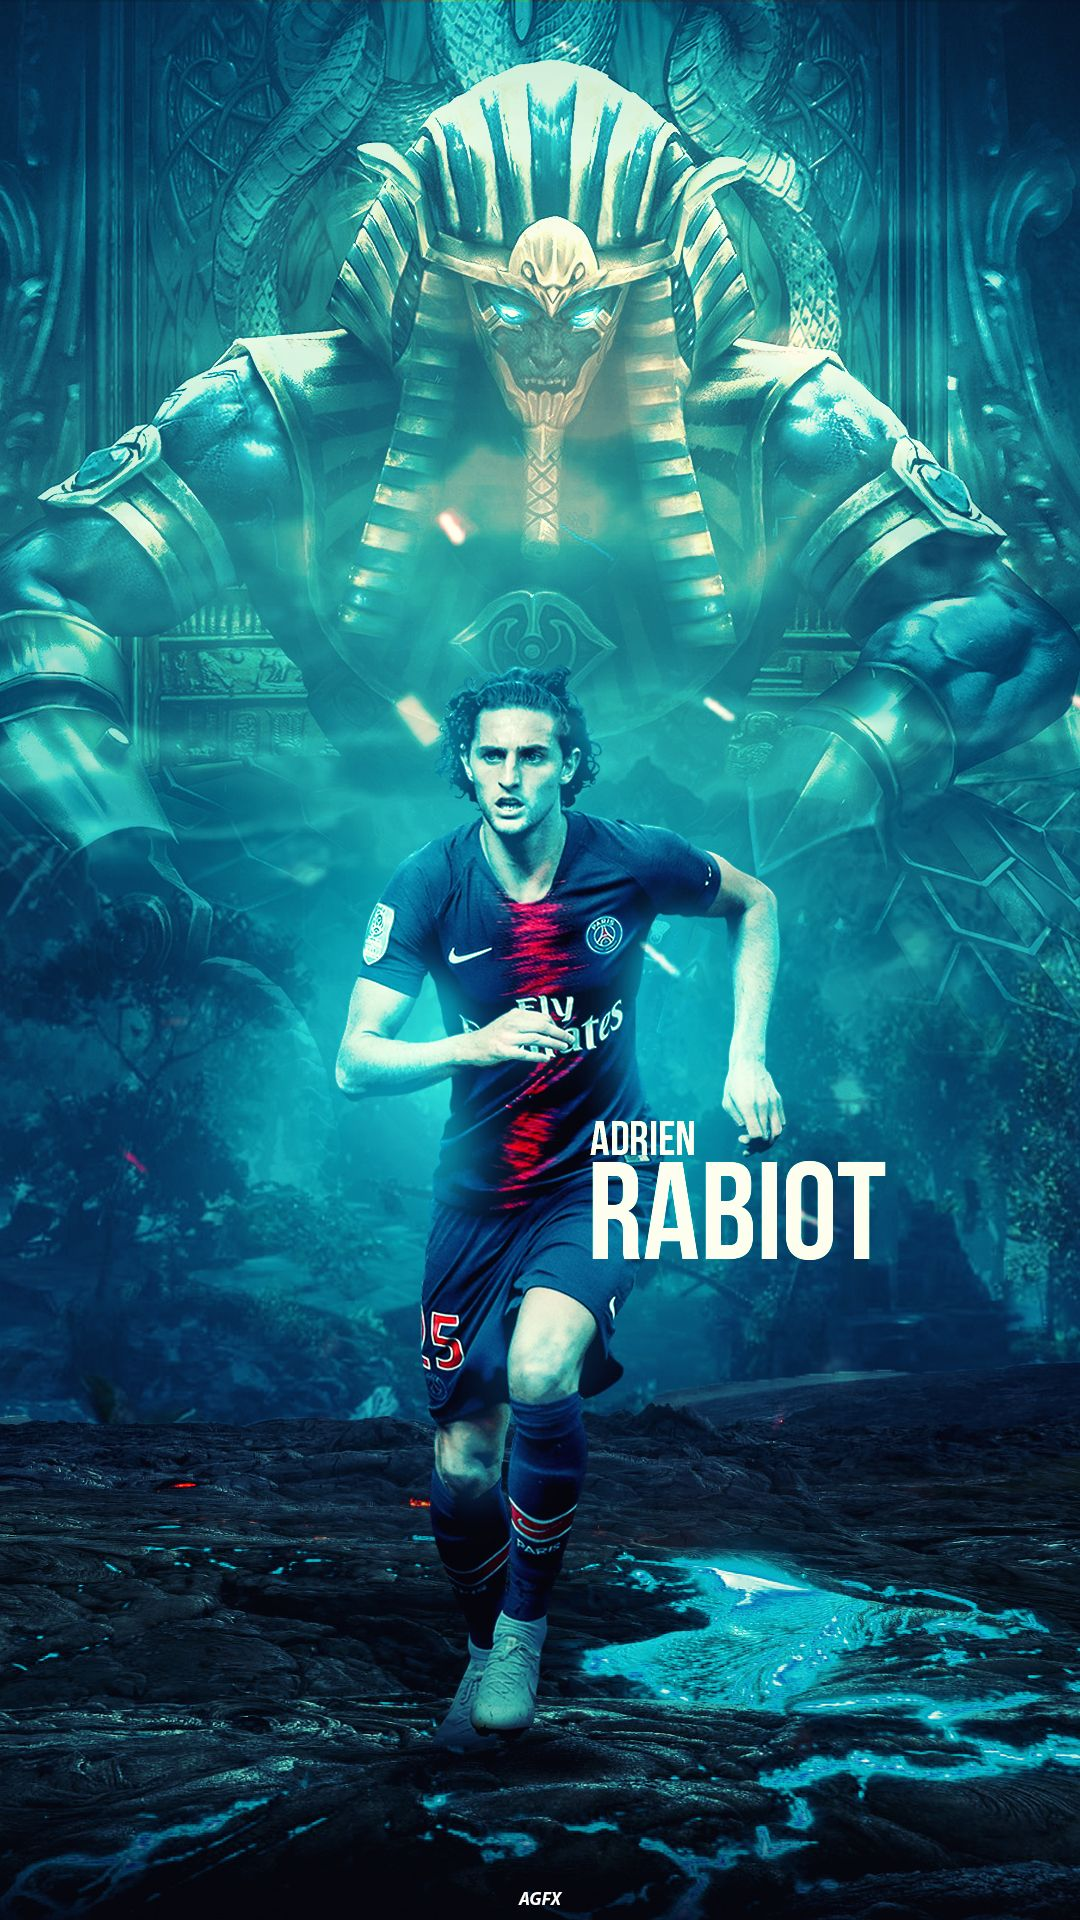 Agfx Designs On Twitter Paris Saint Germain Football Wallpaper Sports Design